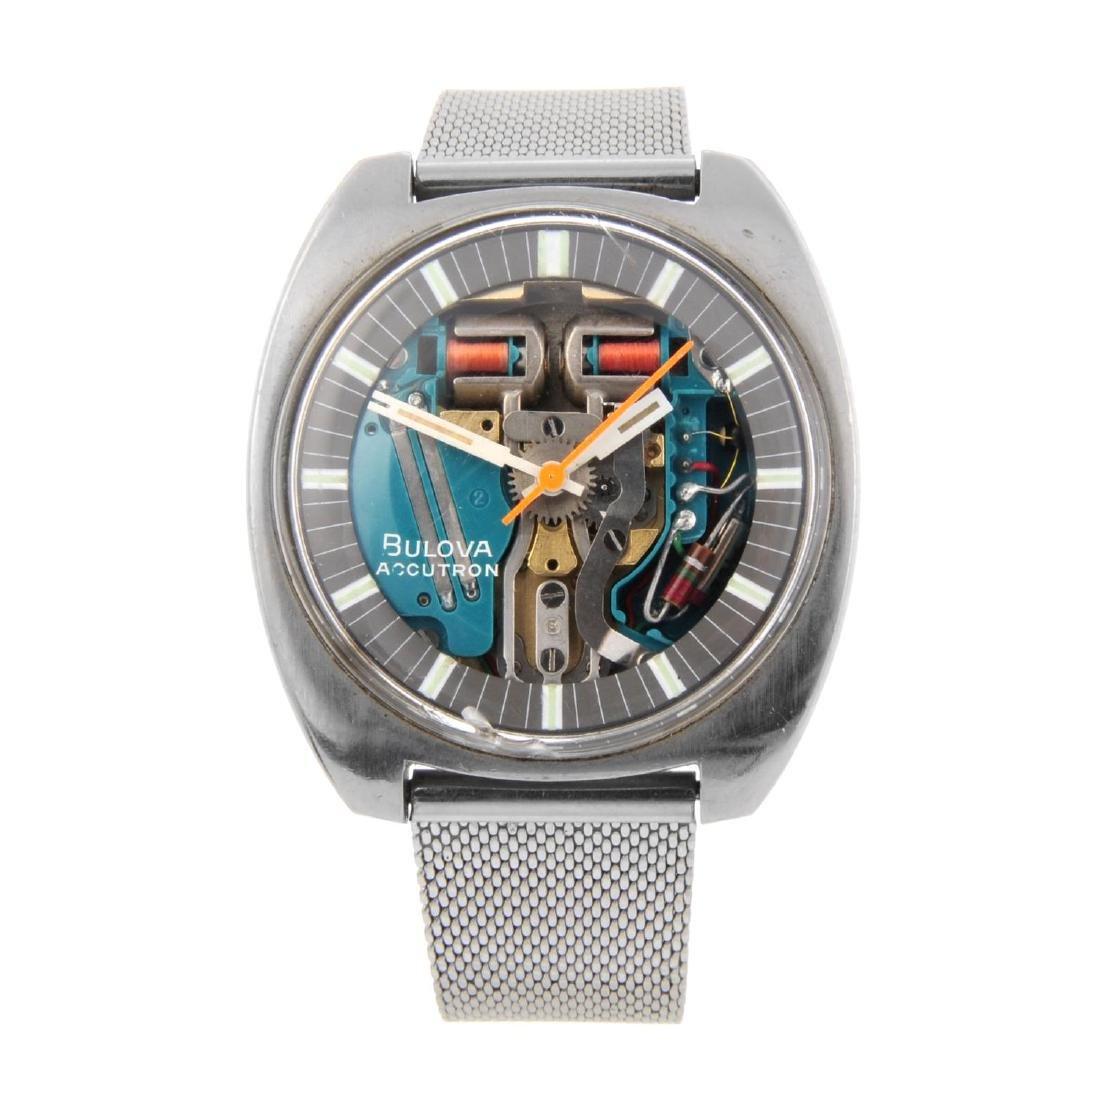 BULOVA - a gentleman's Accutron Spaceview bracelet